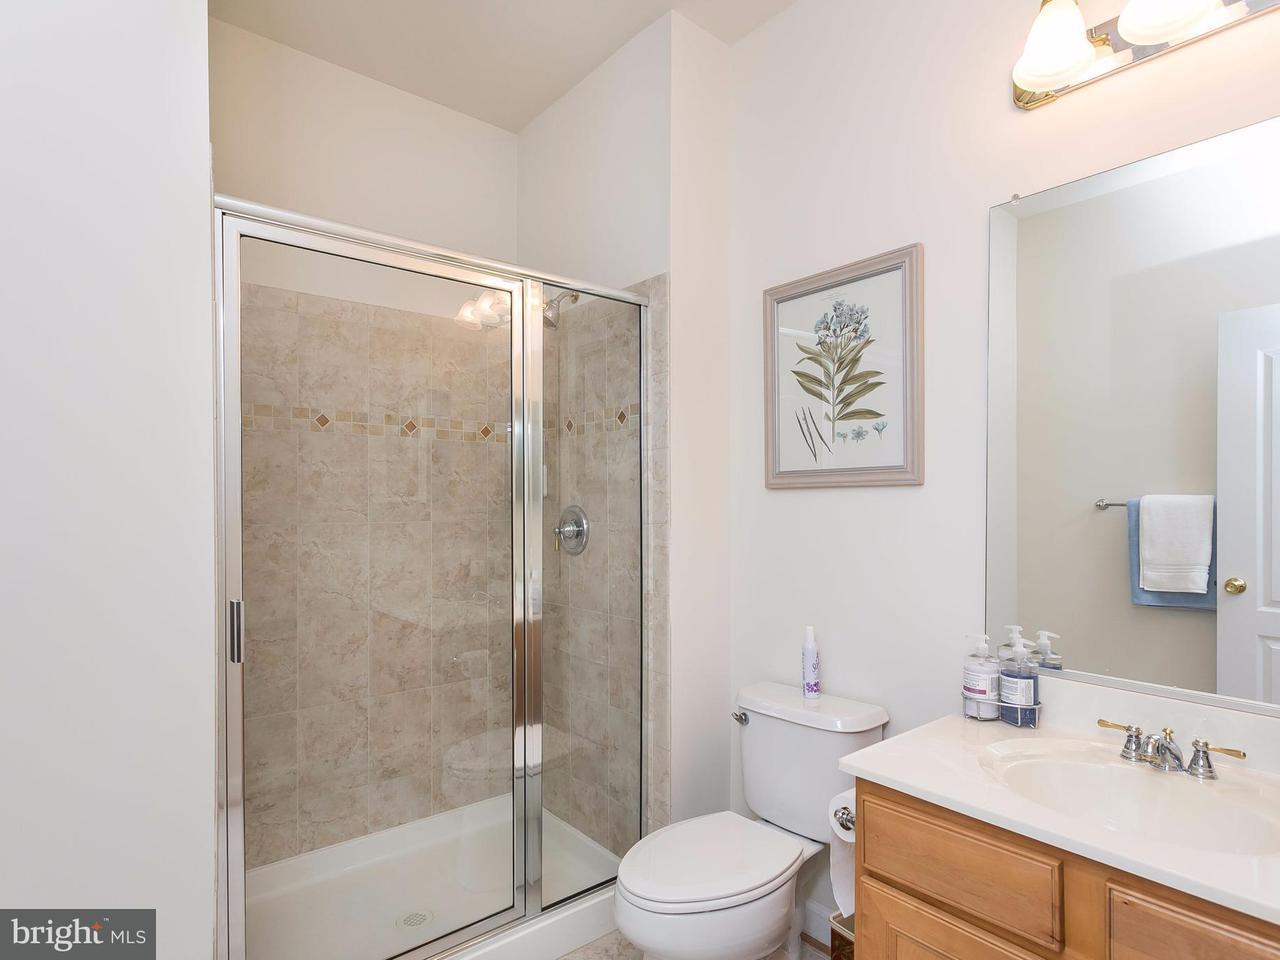 Additional photo for property listing at 8 BERKLEY Court 8 BERKLEY Court Freeland, 馬里蘭州 21053 美國